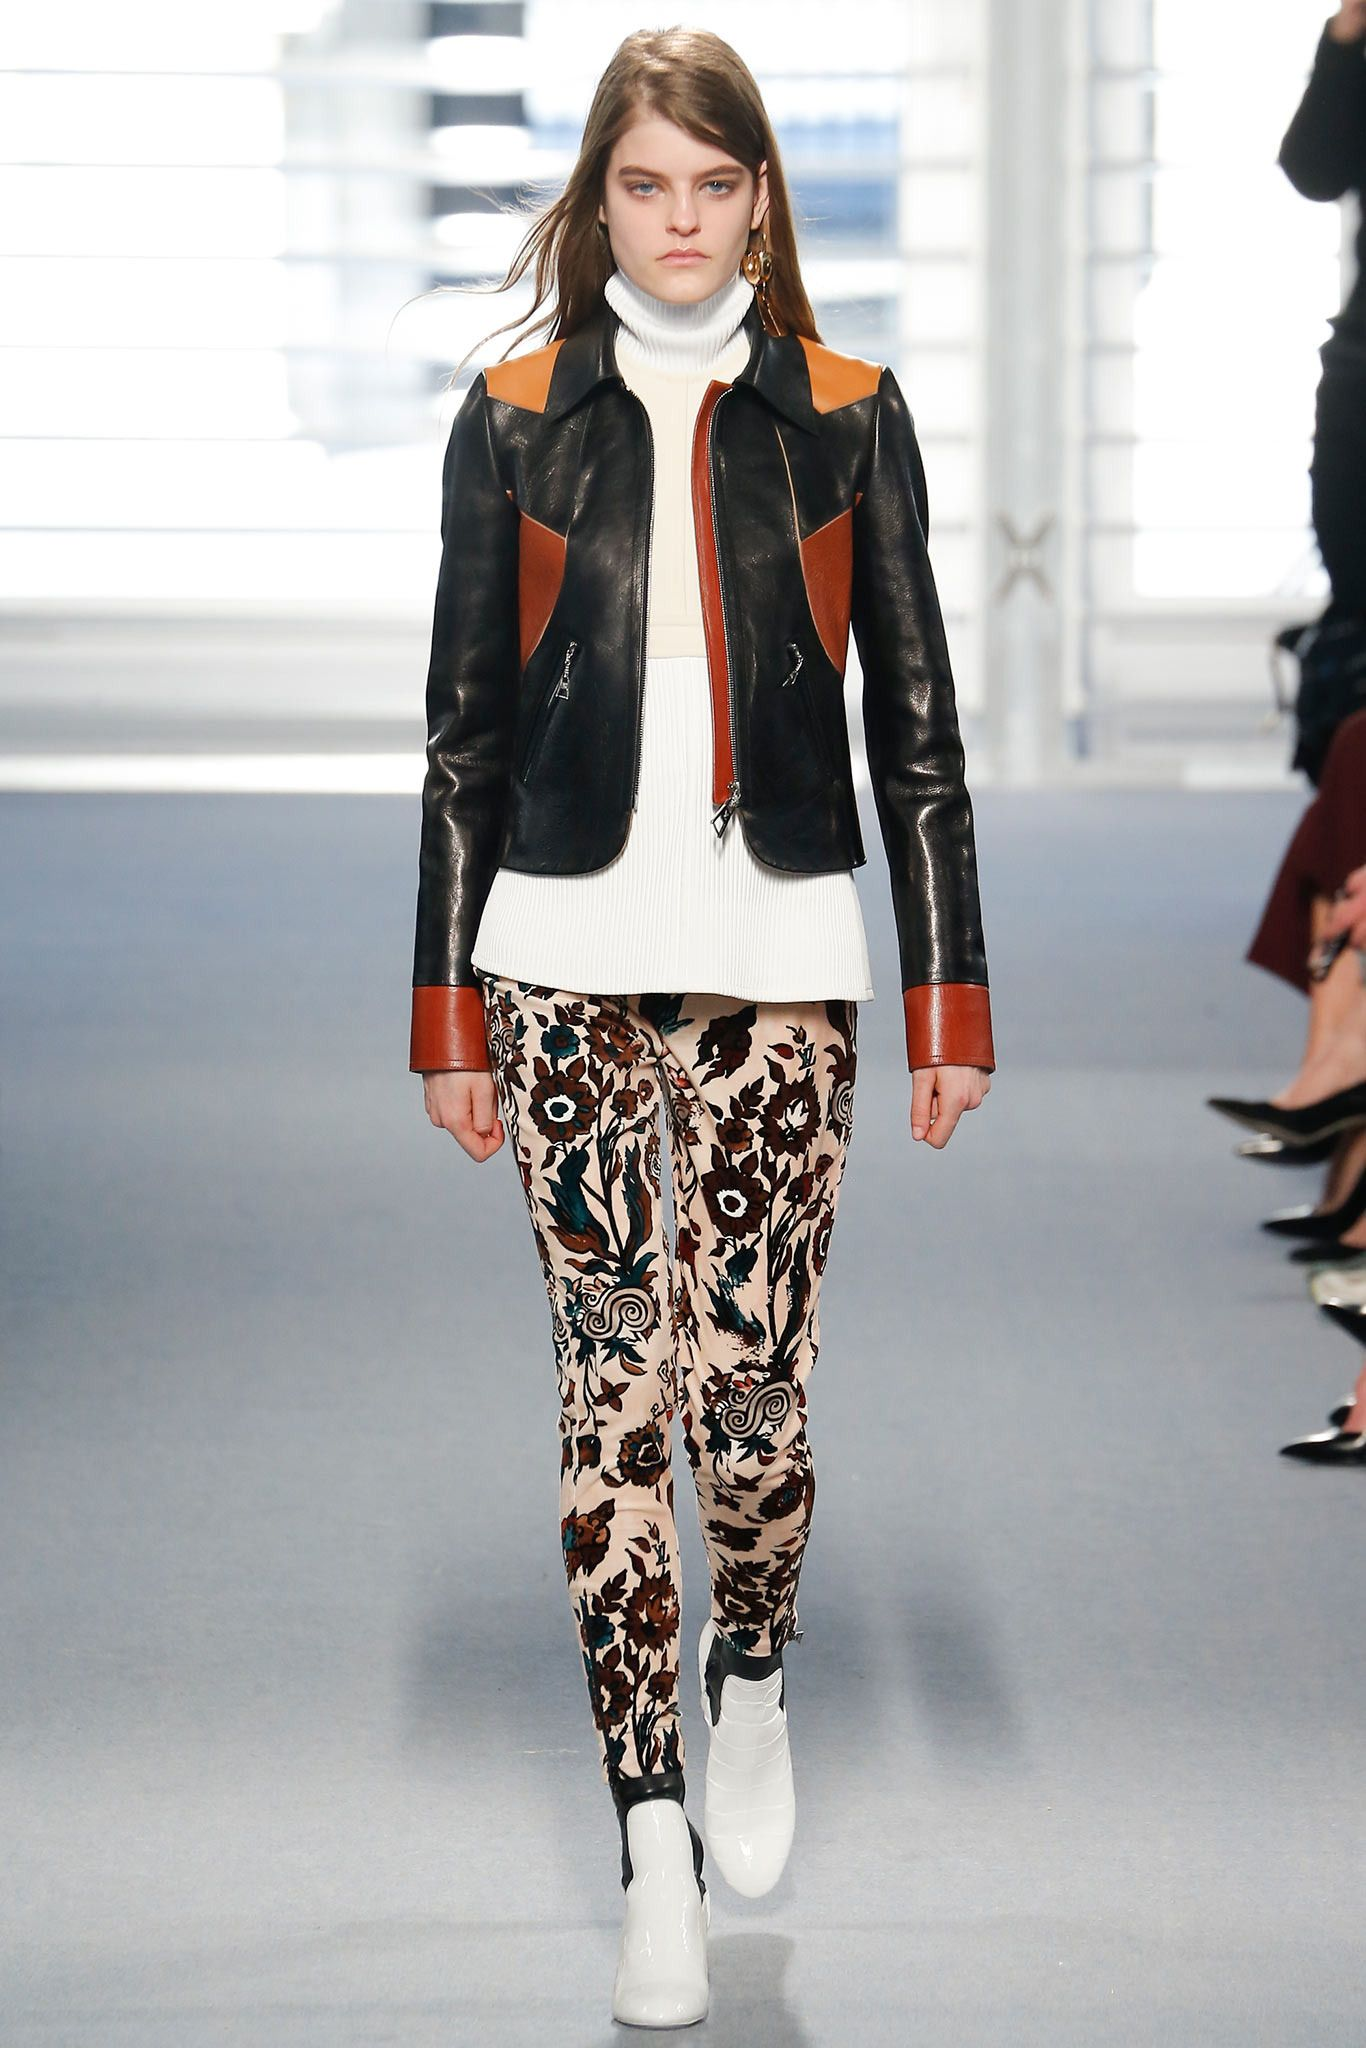 Fall 2014 Ready-to-Wear - Louis Vuitton